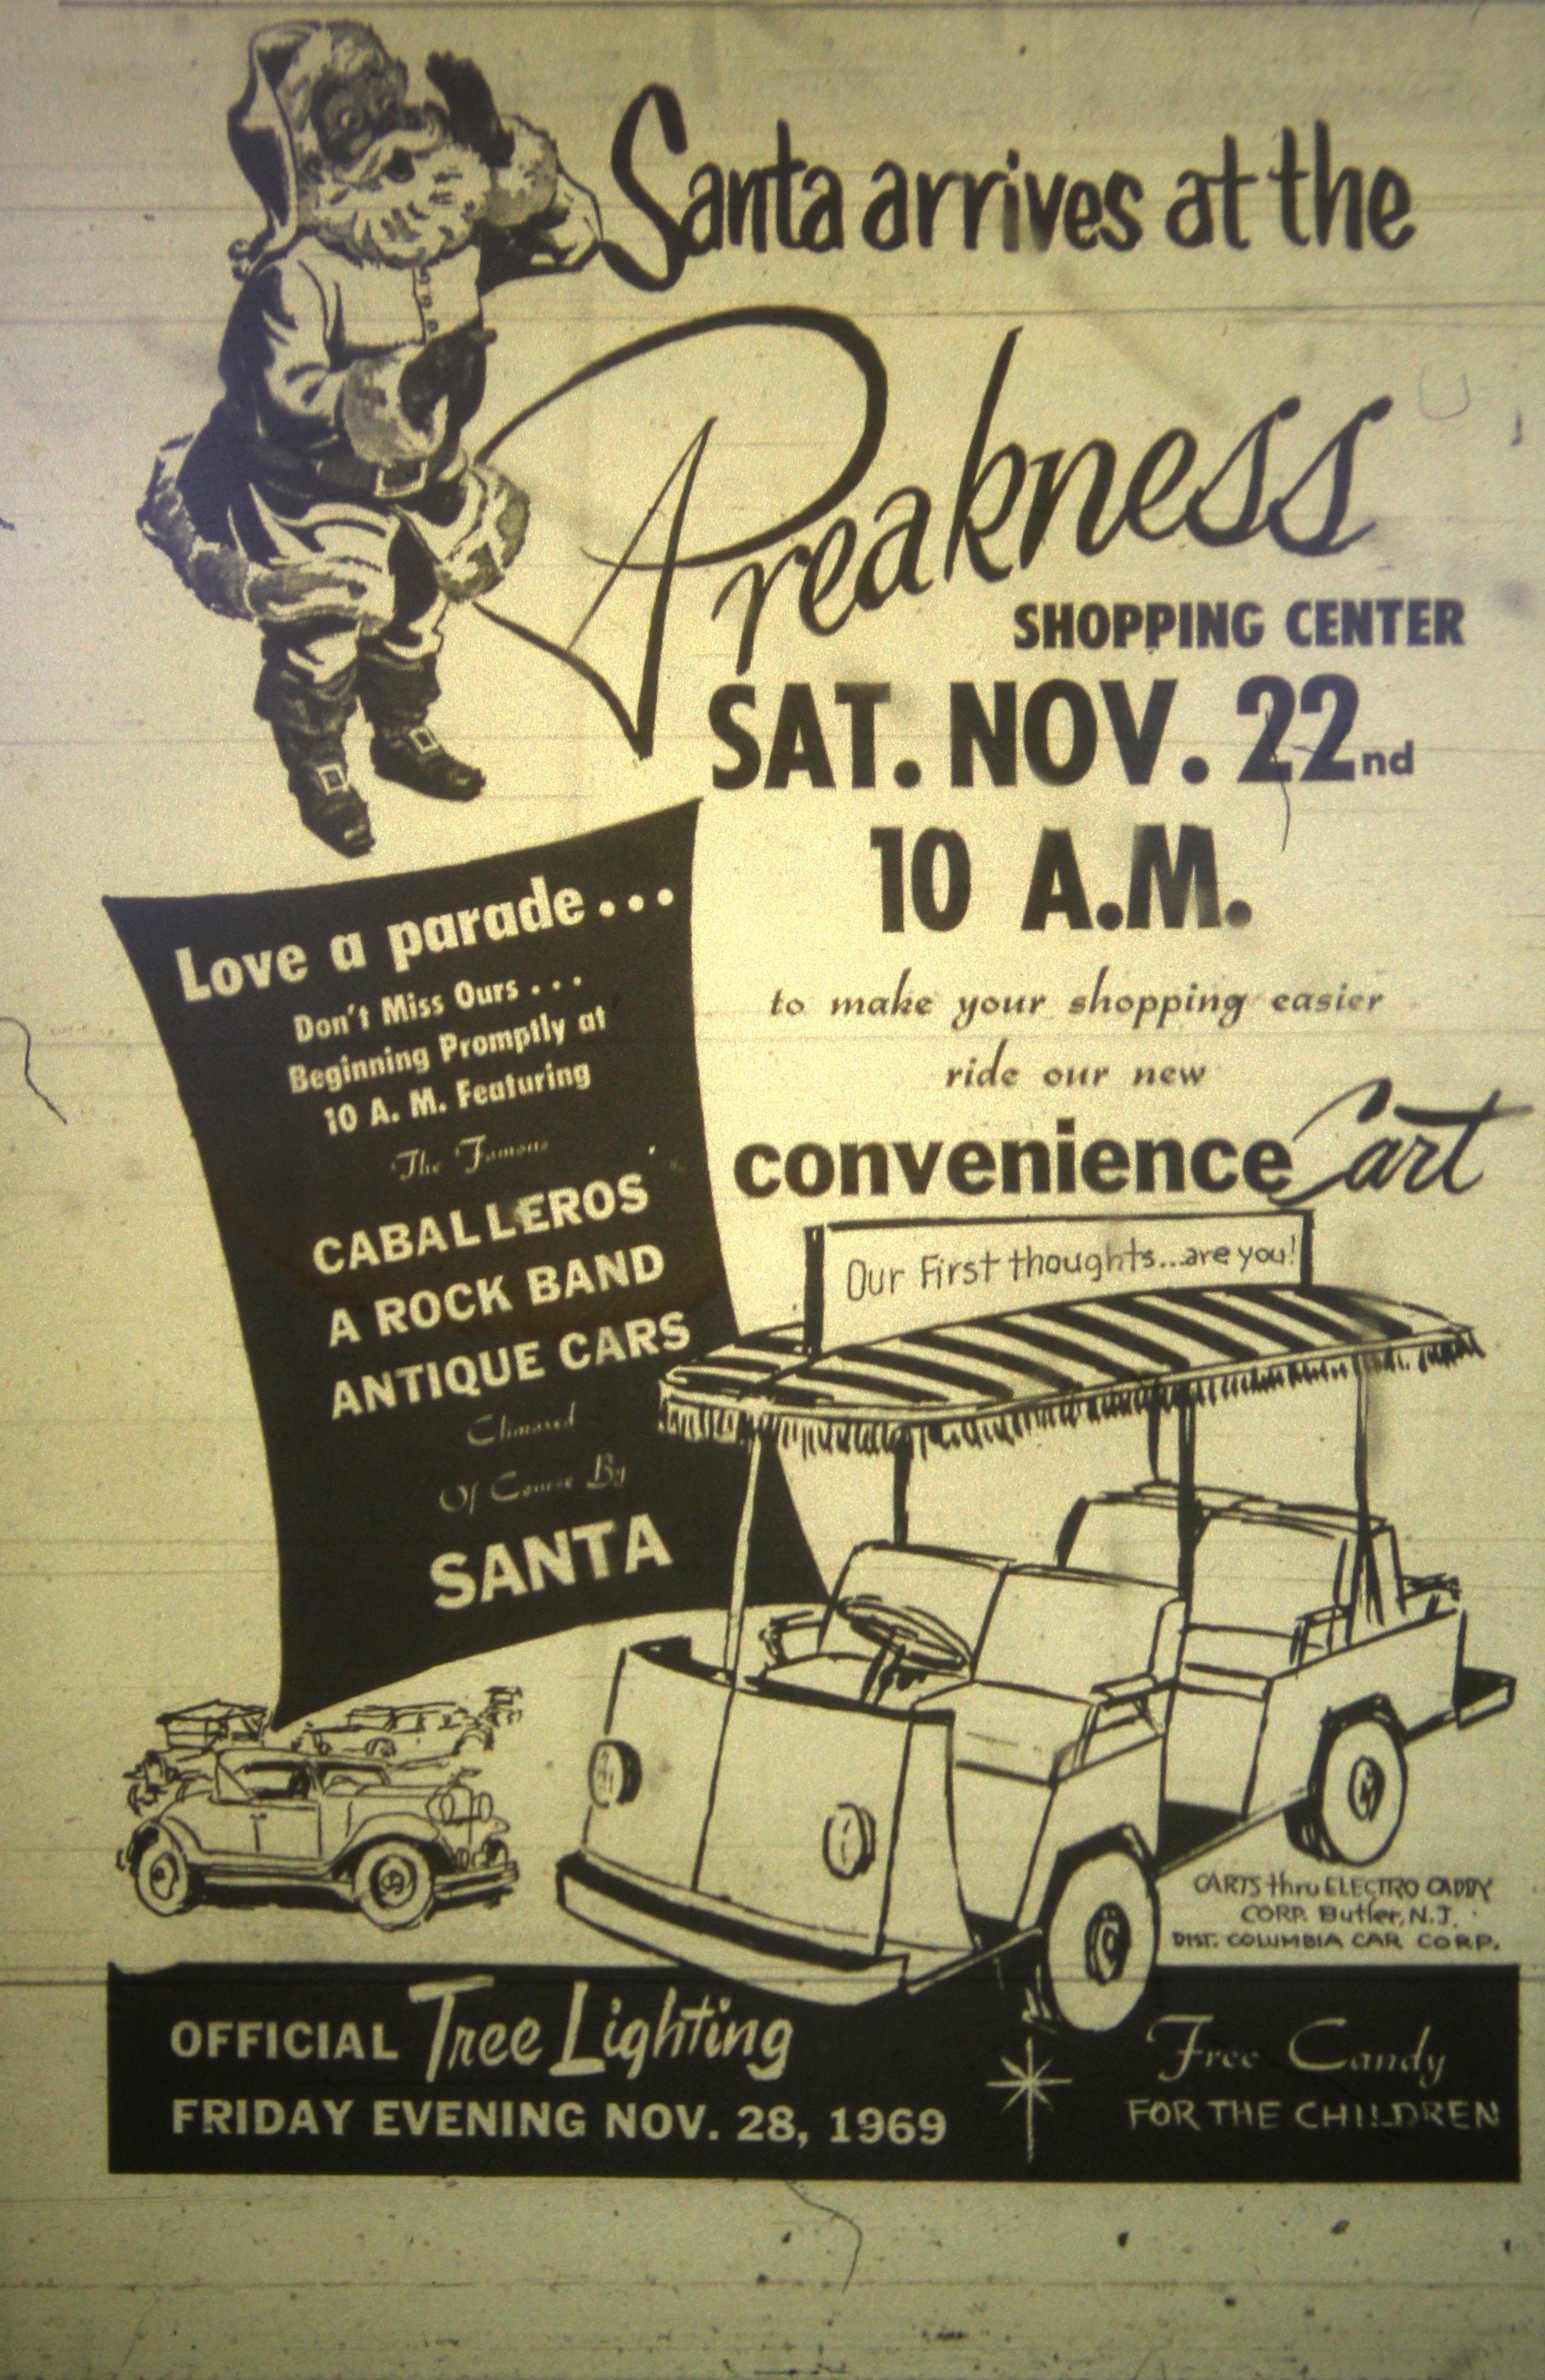 New jersey passaic county wayne - Preakness Holiday Ad In Wayne Nj 1969